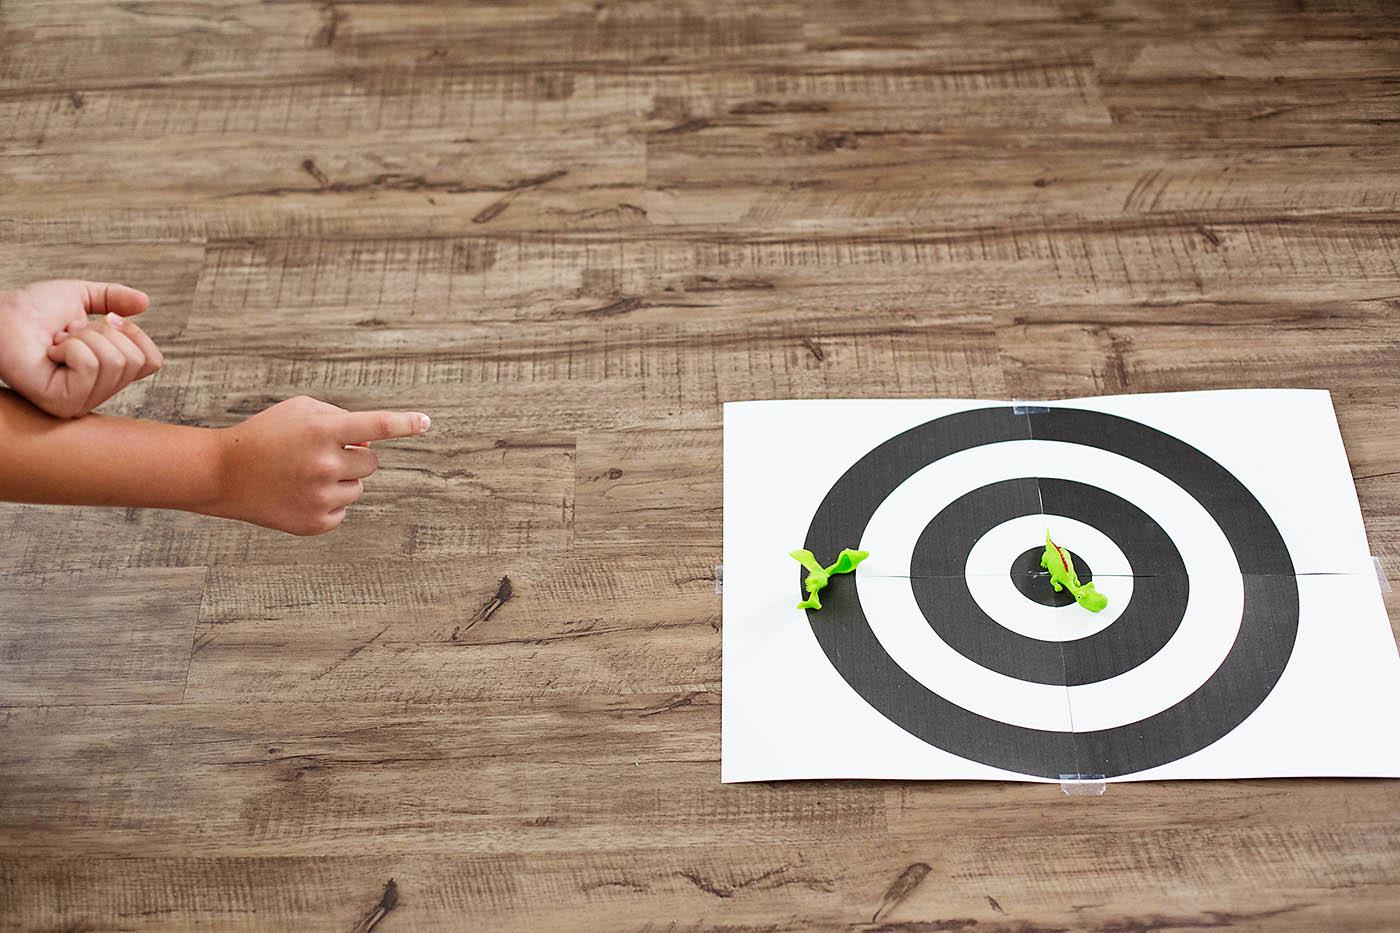 aftb-easy-toy-target-game-7